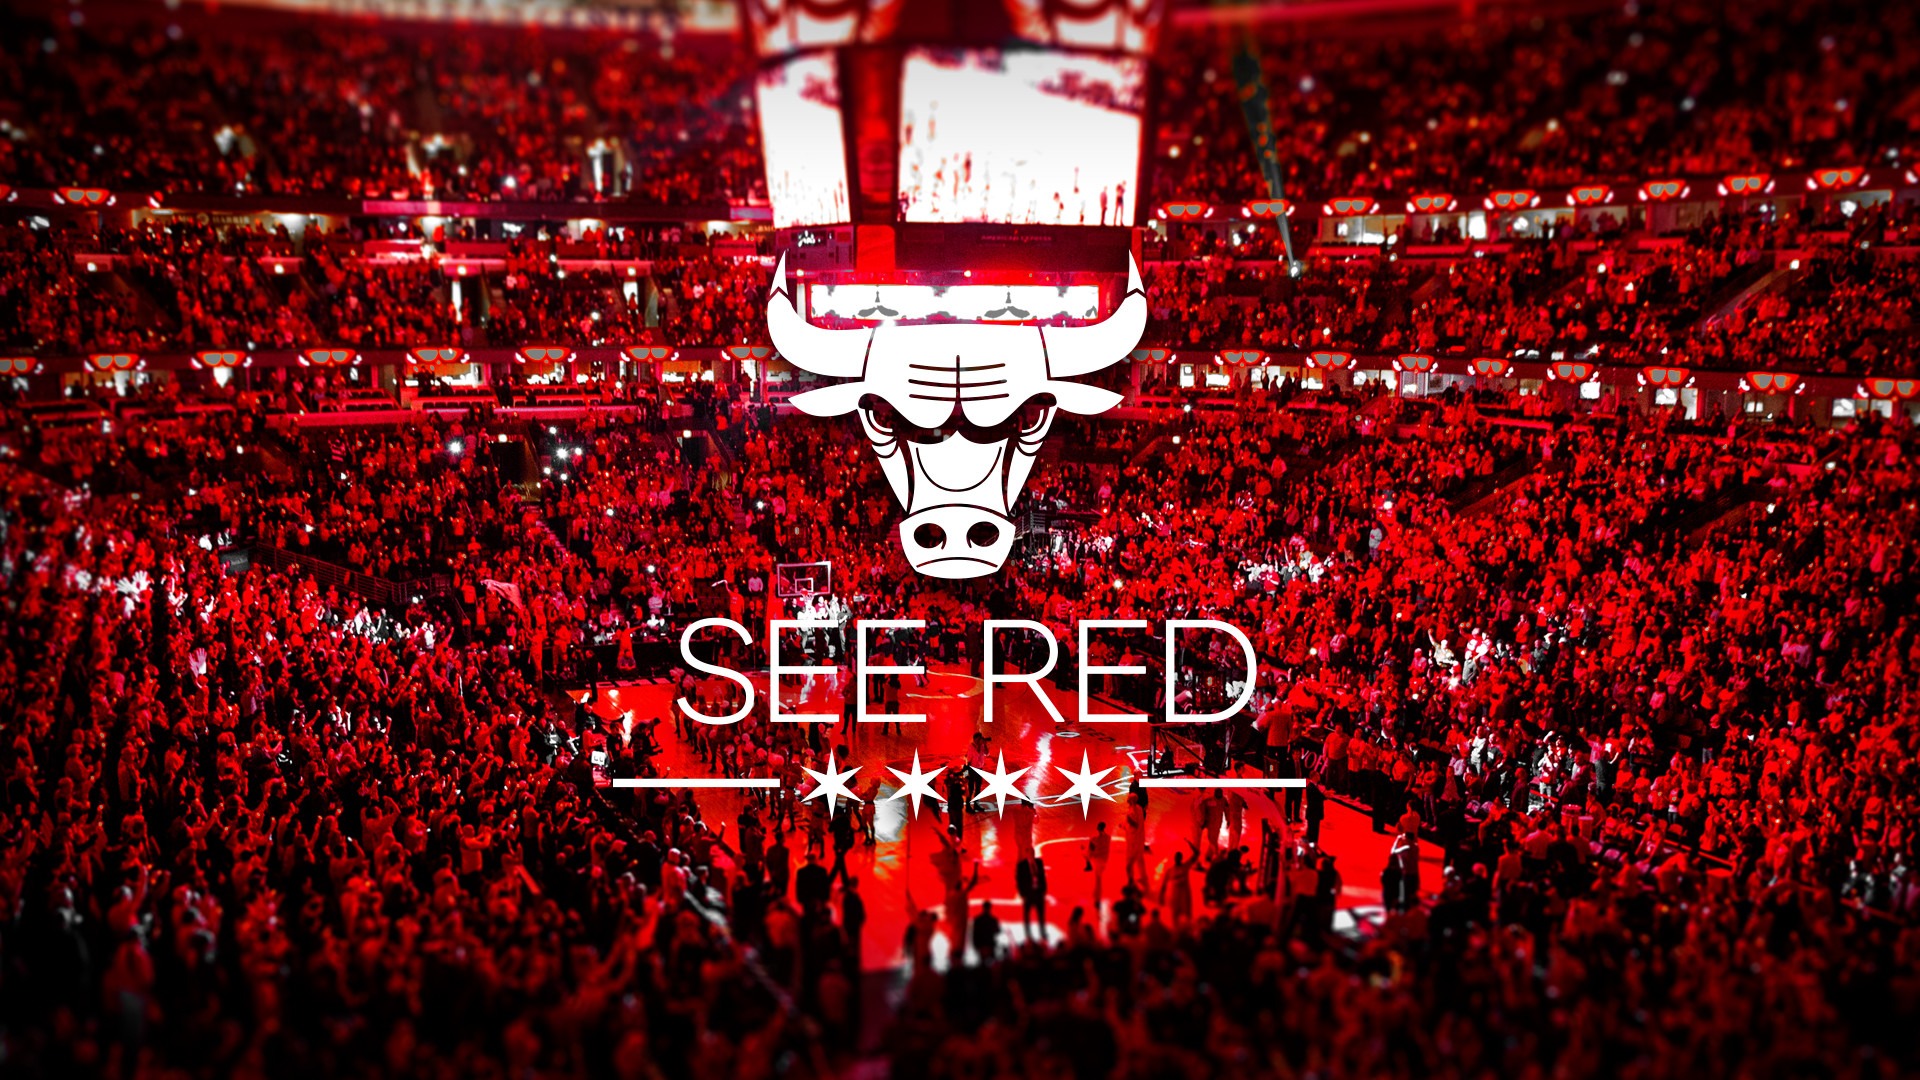 The chicago bulls wallpaper hd.